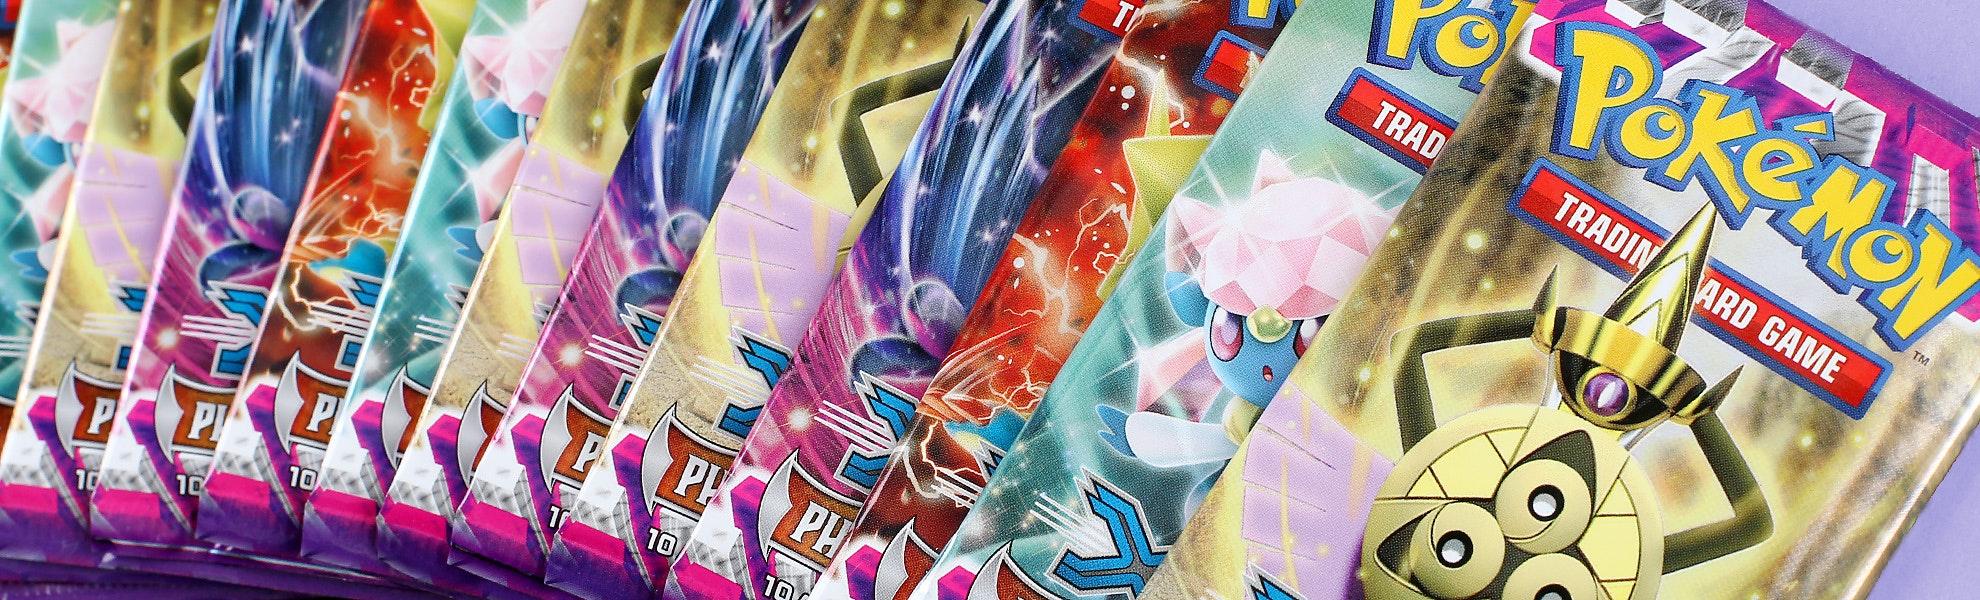 Pokemon Phantom Forces Booster Box